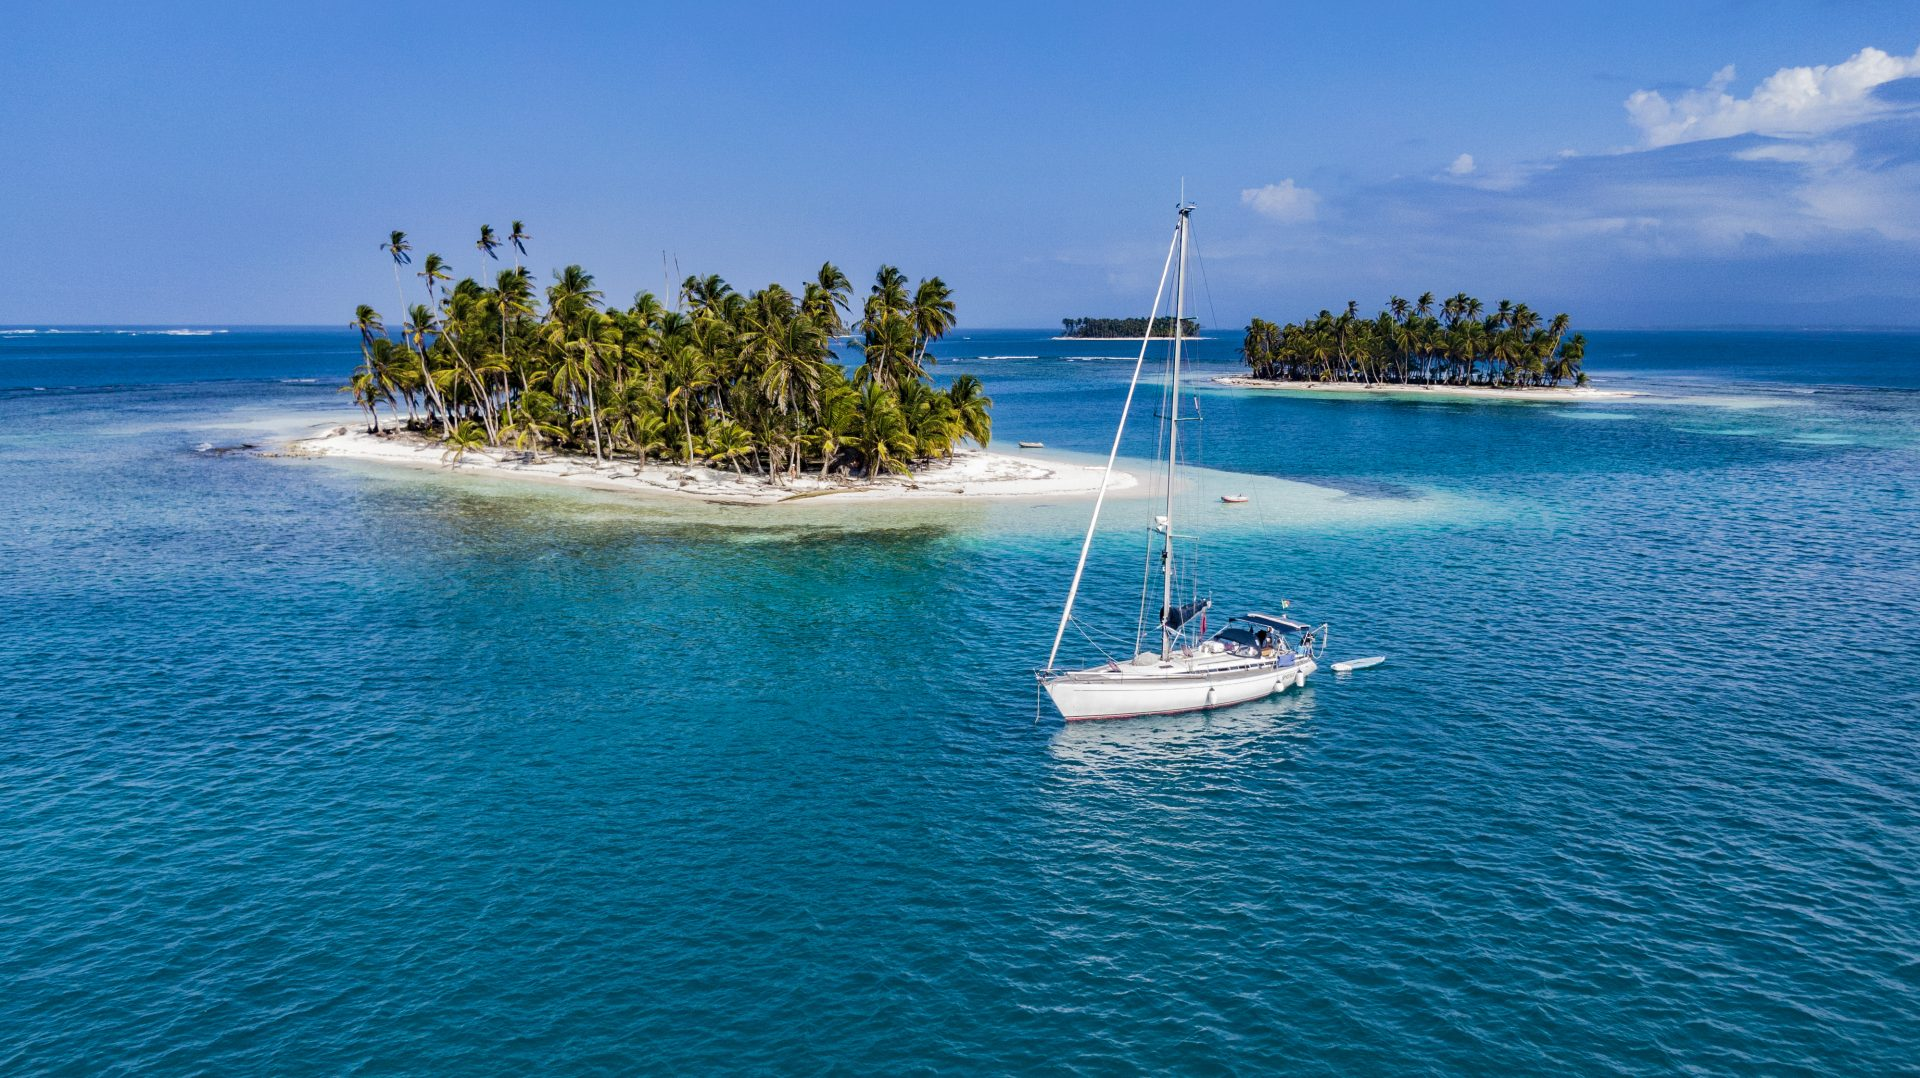 San_blas_sailboat